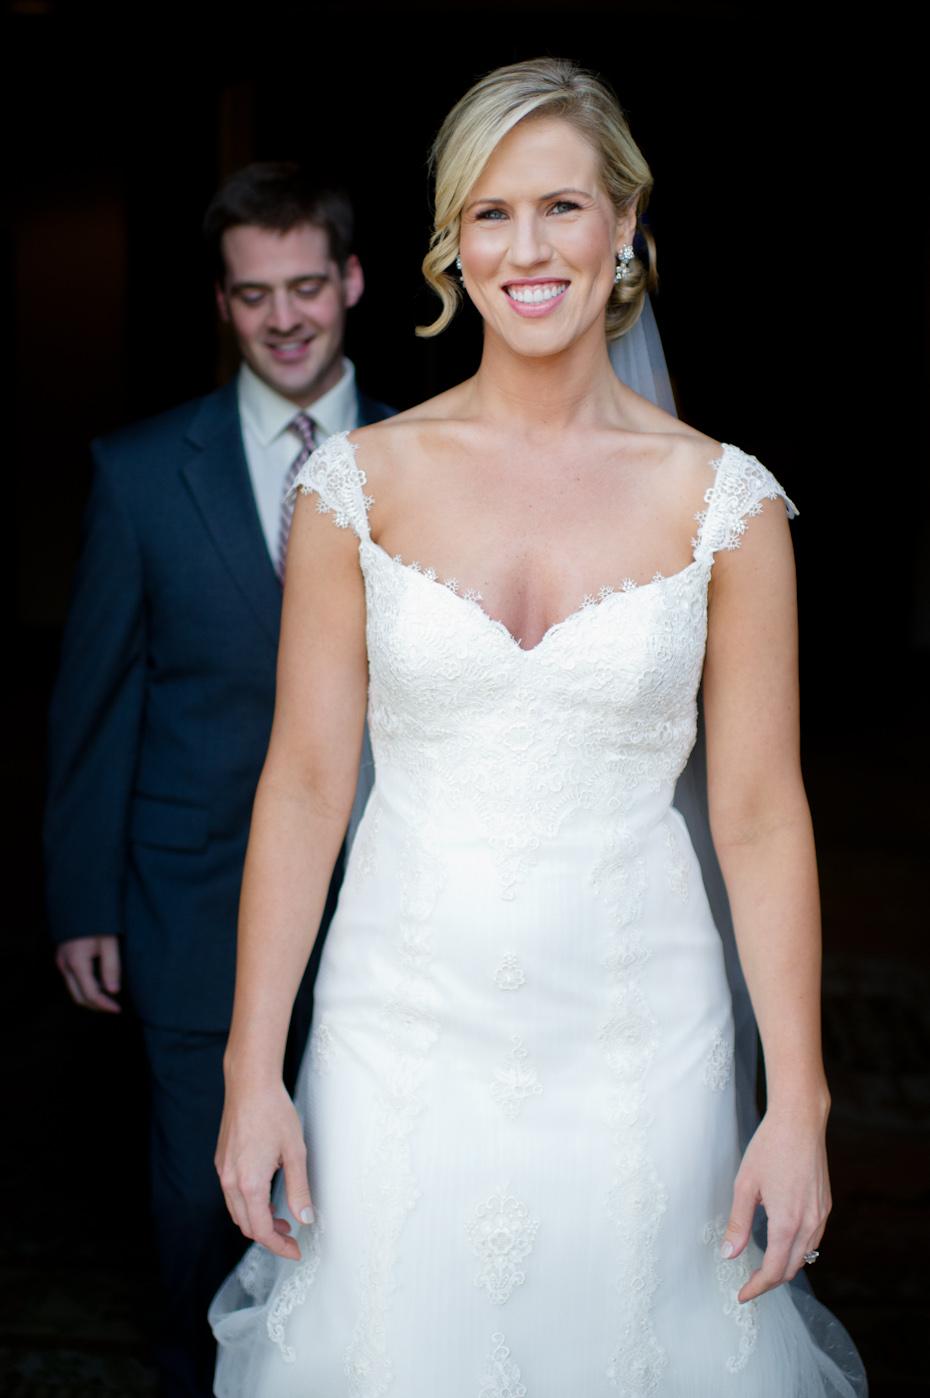 Wedding Photographers in Nashville, TN